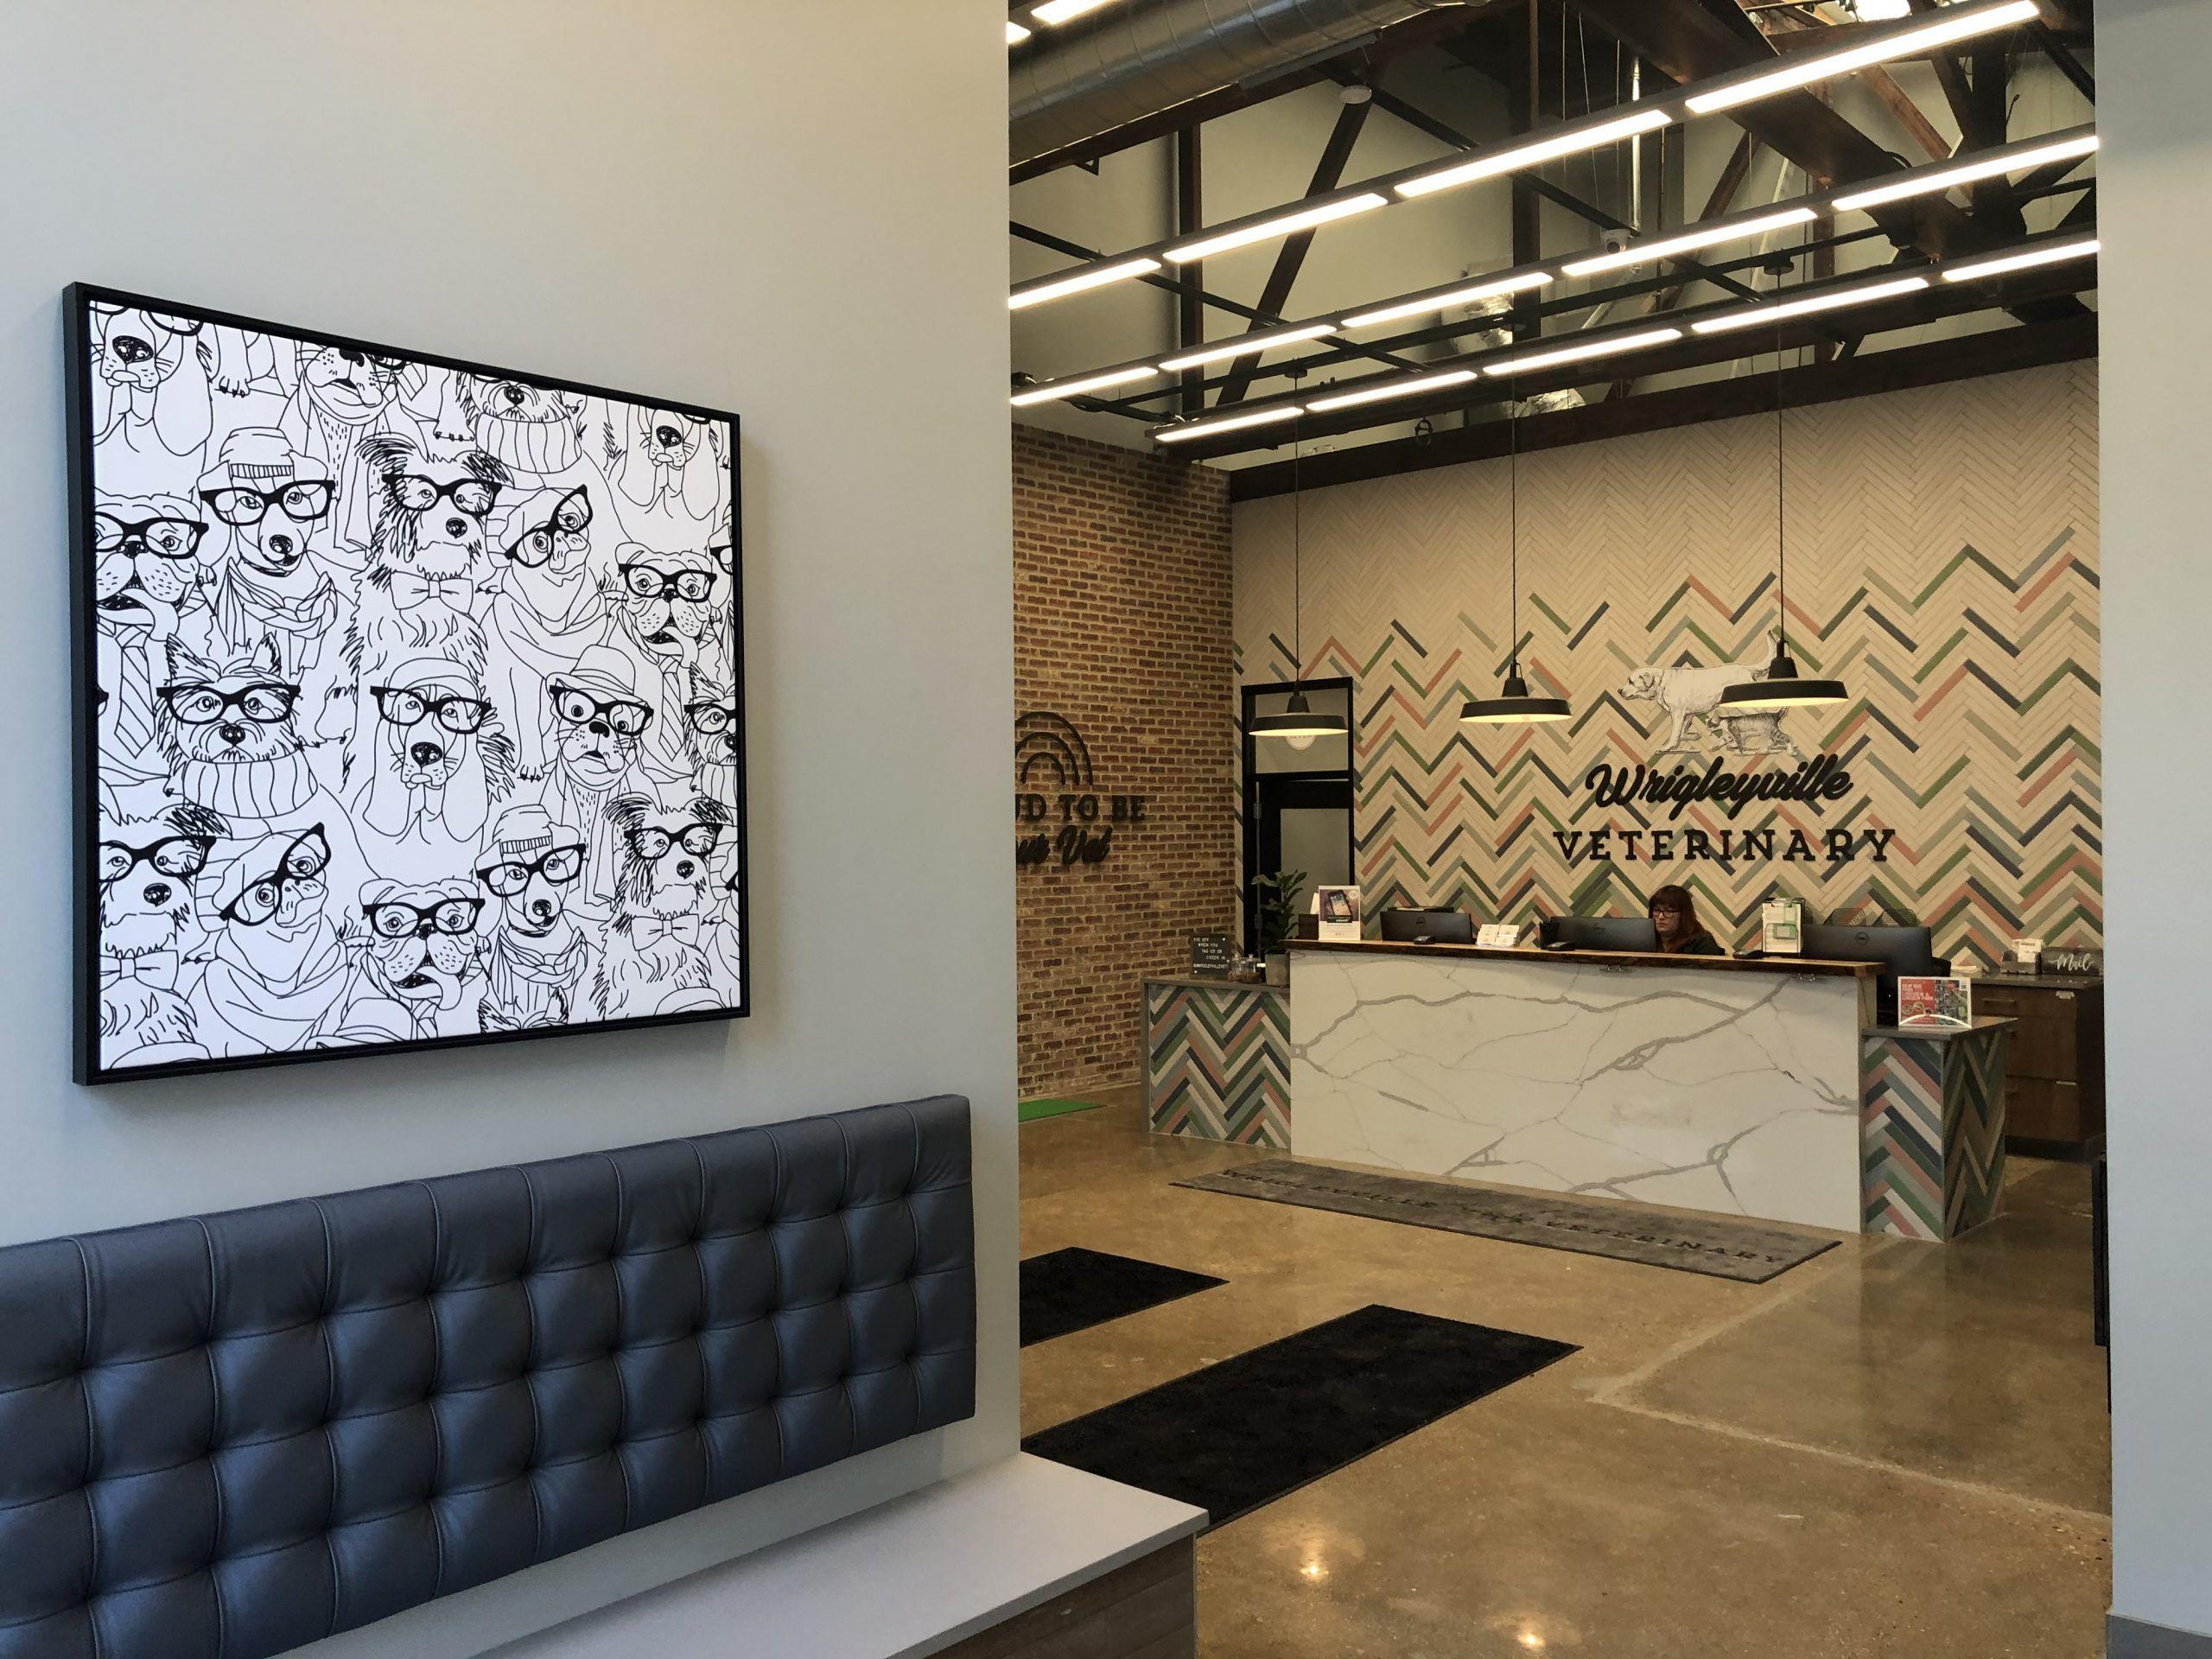 Wrigleyville Veterinary, Chicago IL RWE Design Build in